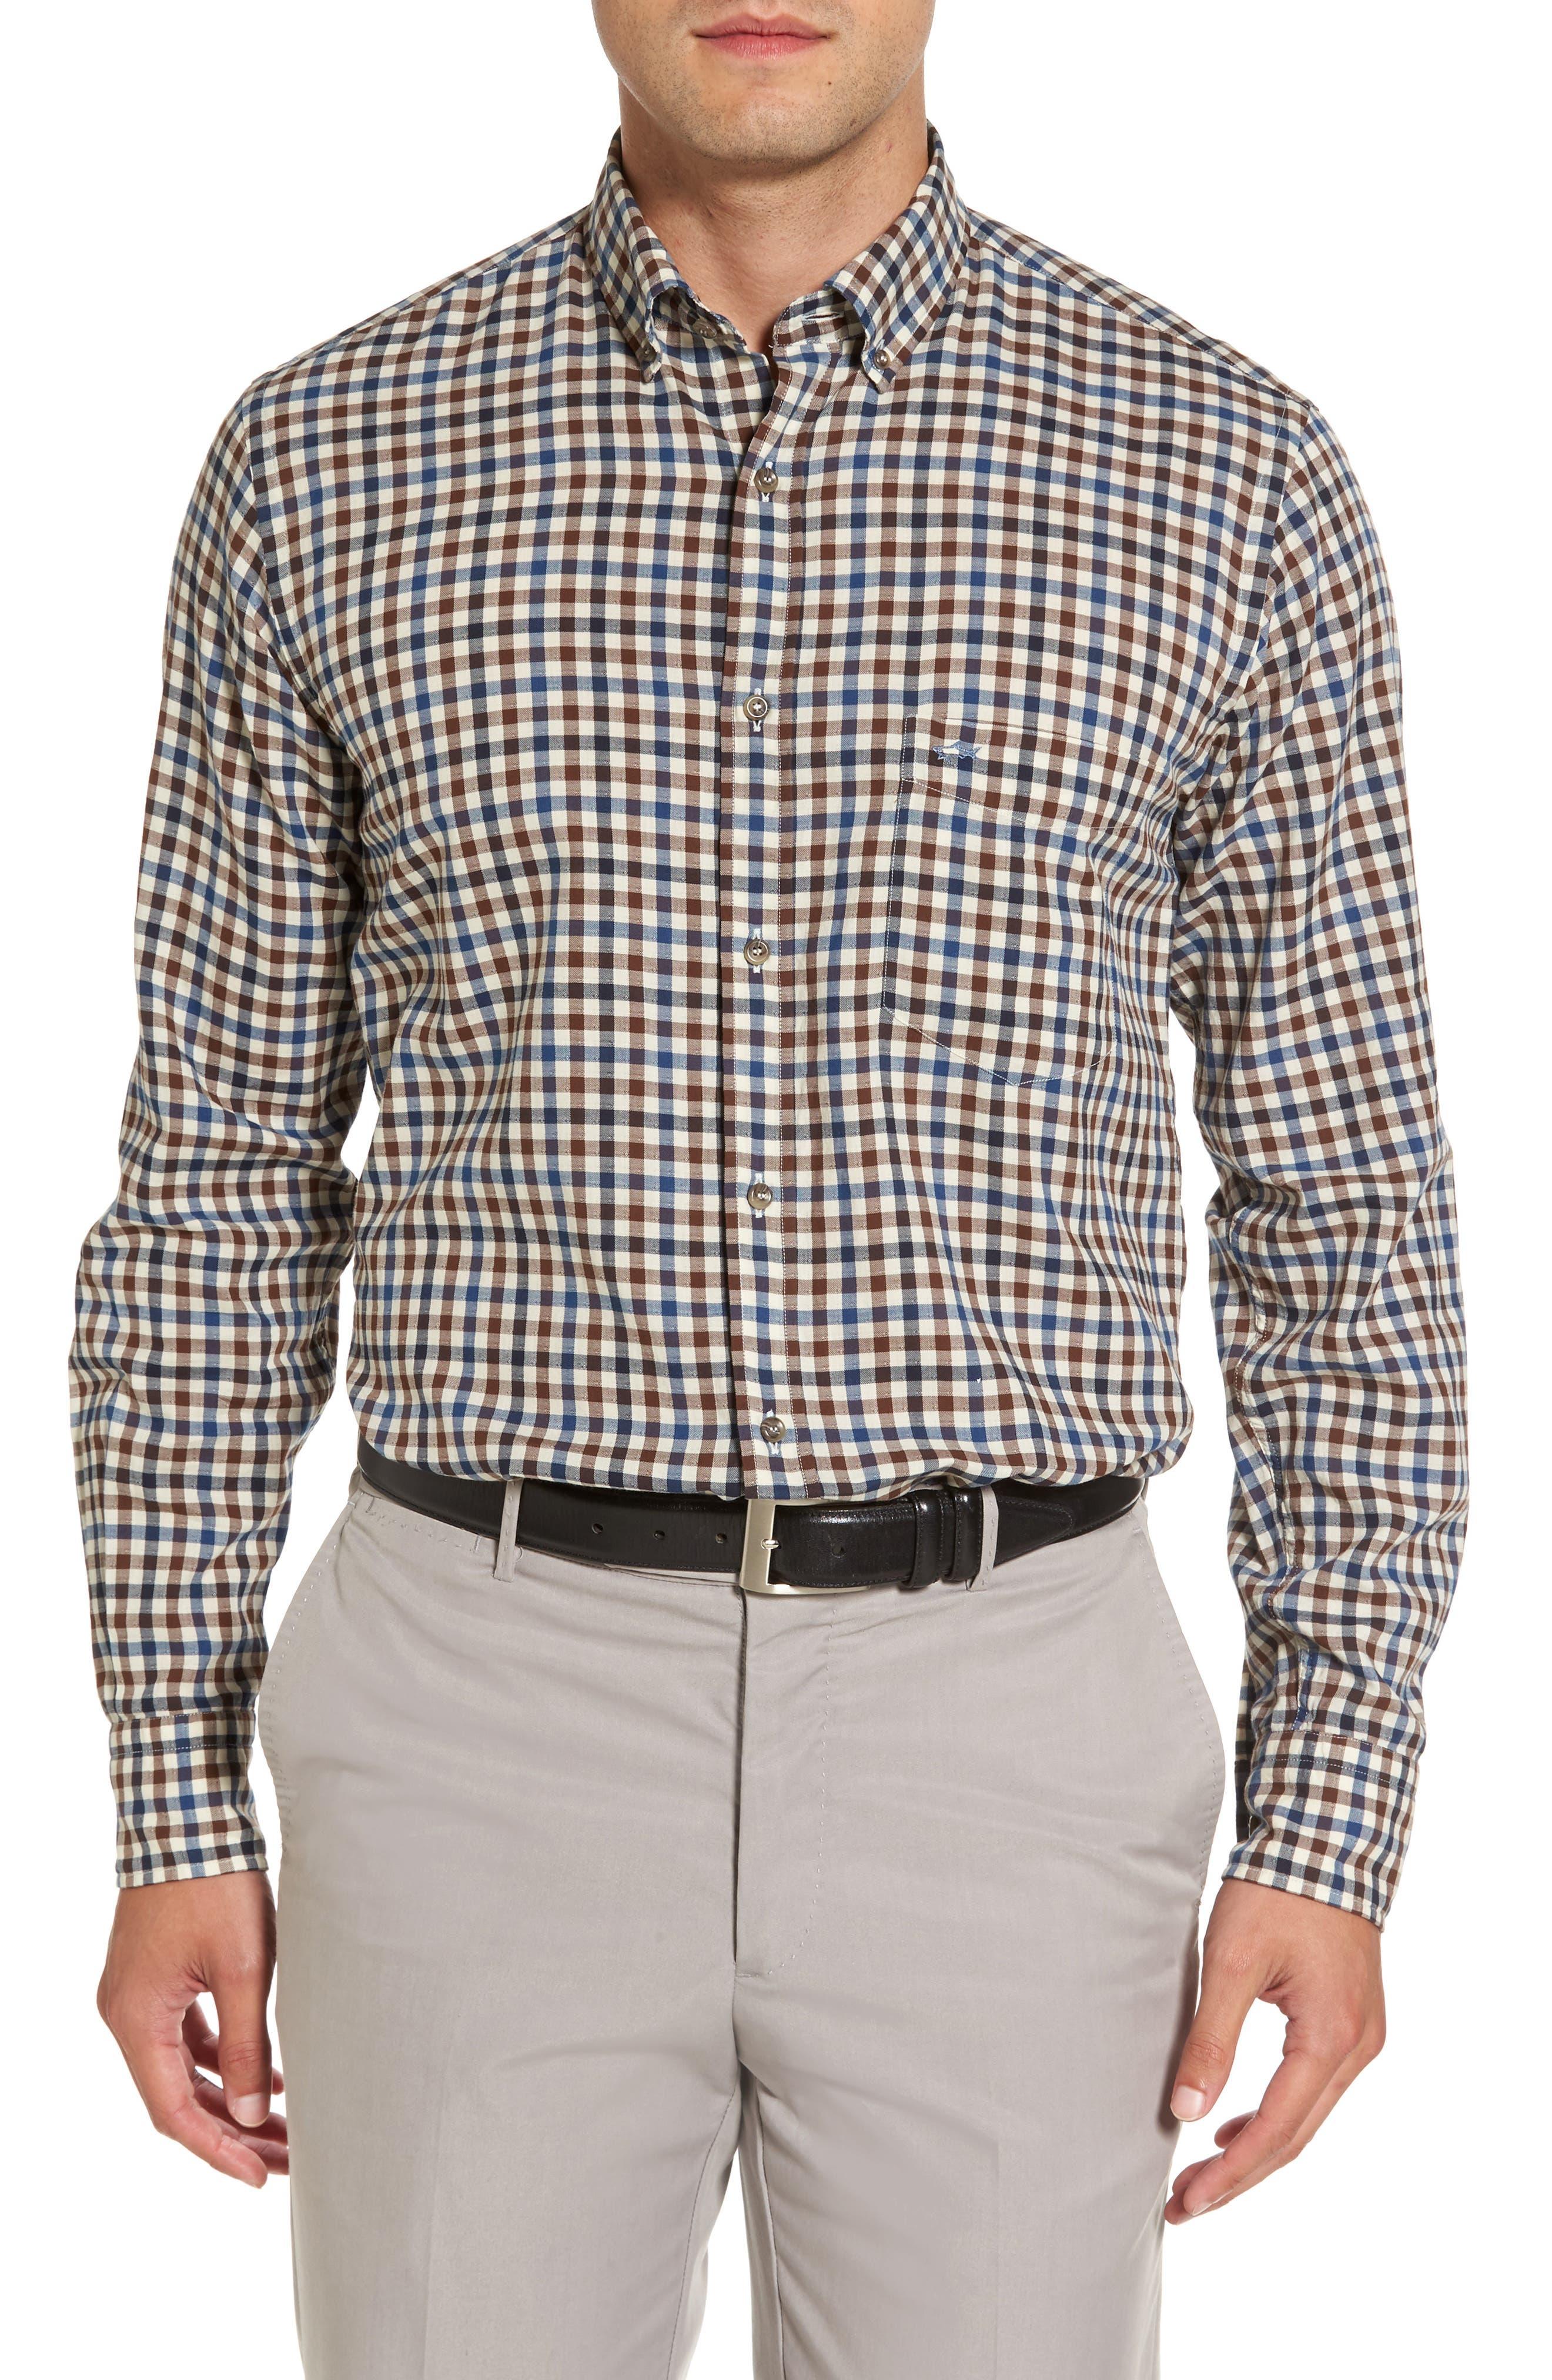 Paul&Shark Jacquard Check Sport Shirt,                         Main,                         color, Brown / Blue / Beige